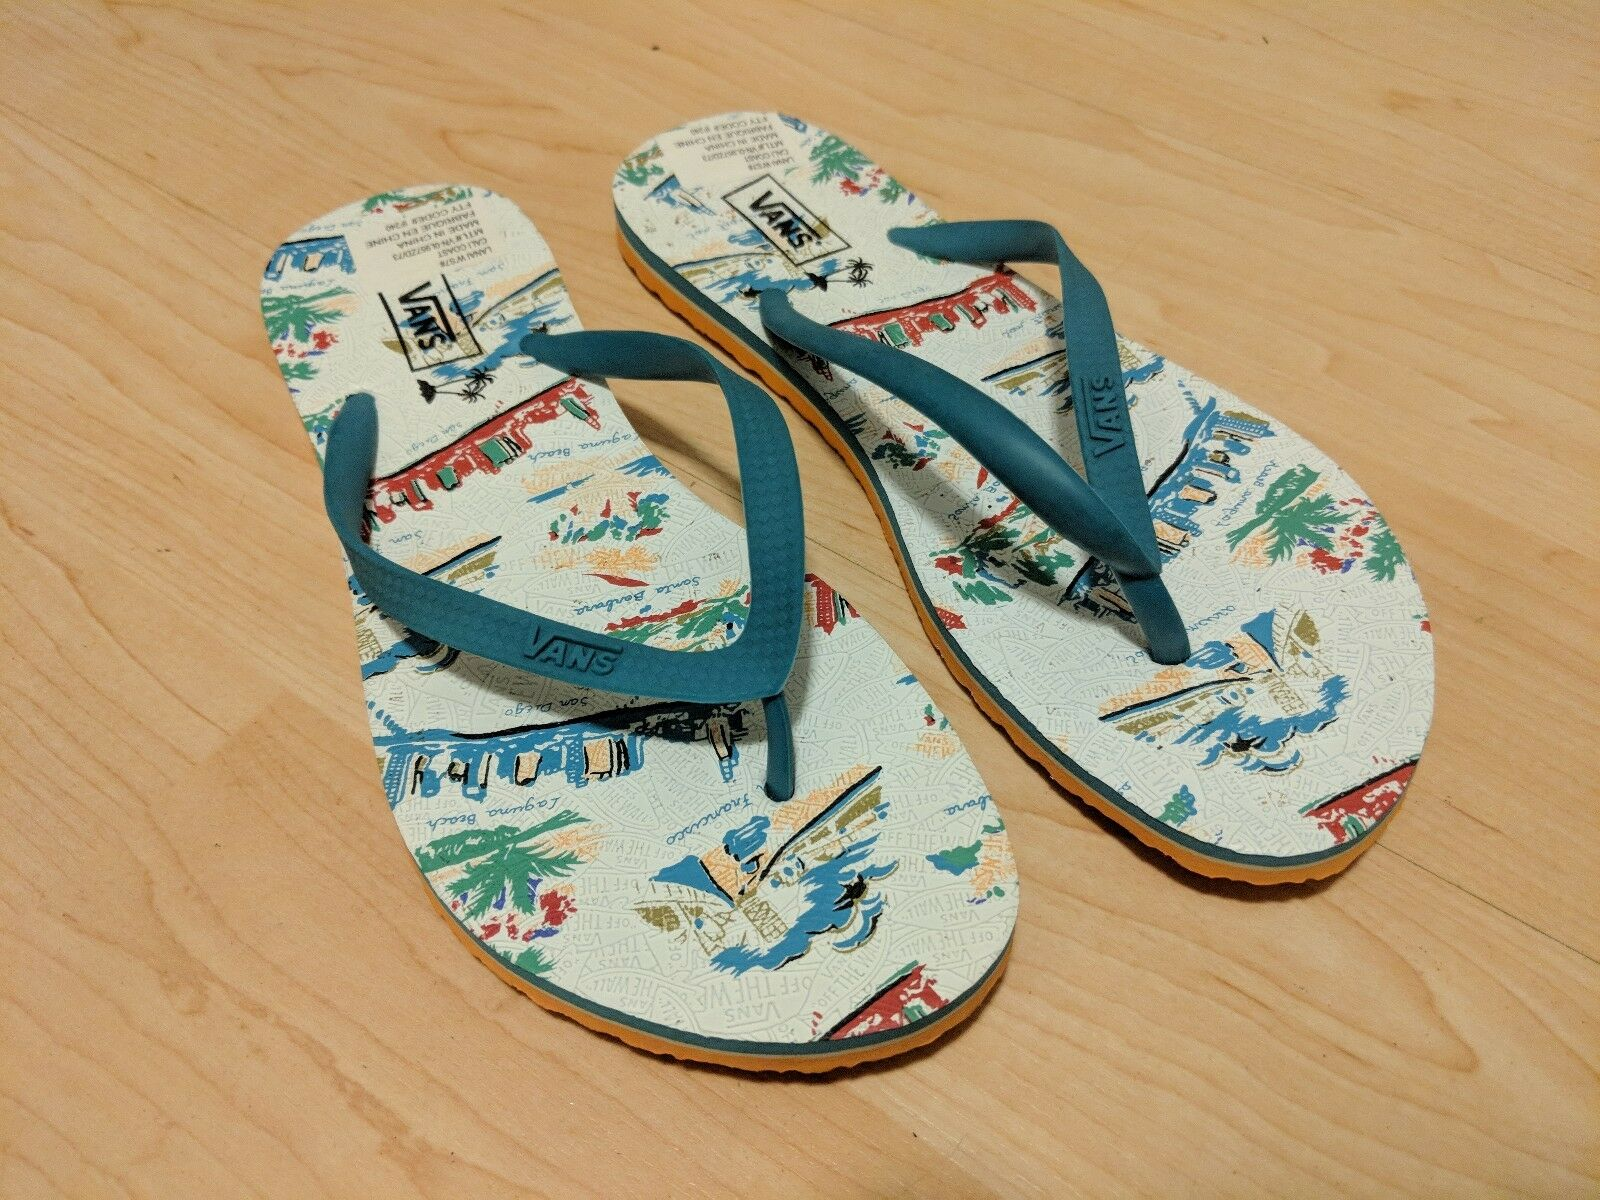 VANS USA New Lanai Lady Size USA VANS 7 6d44fc